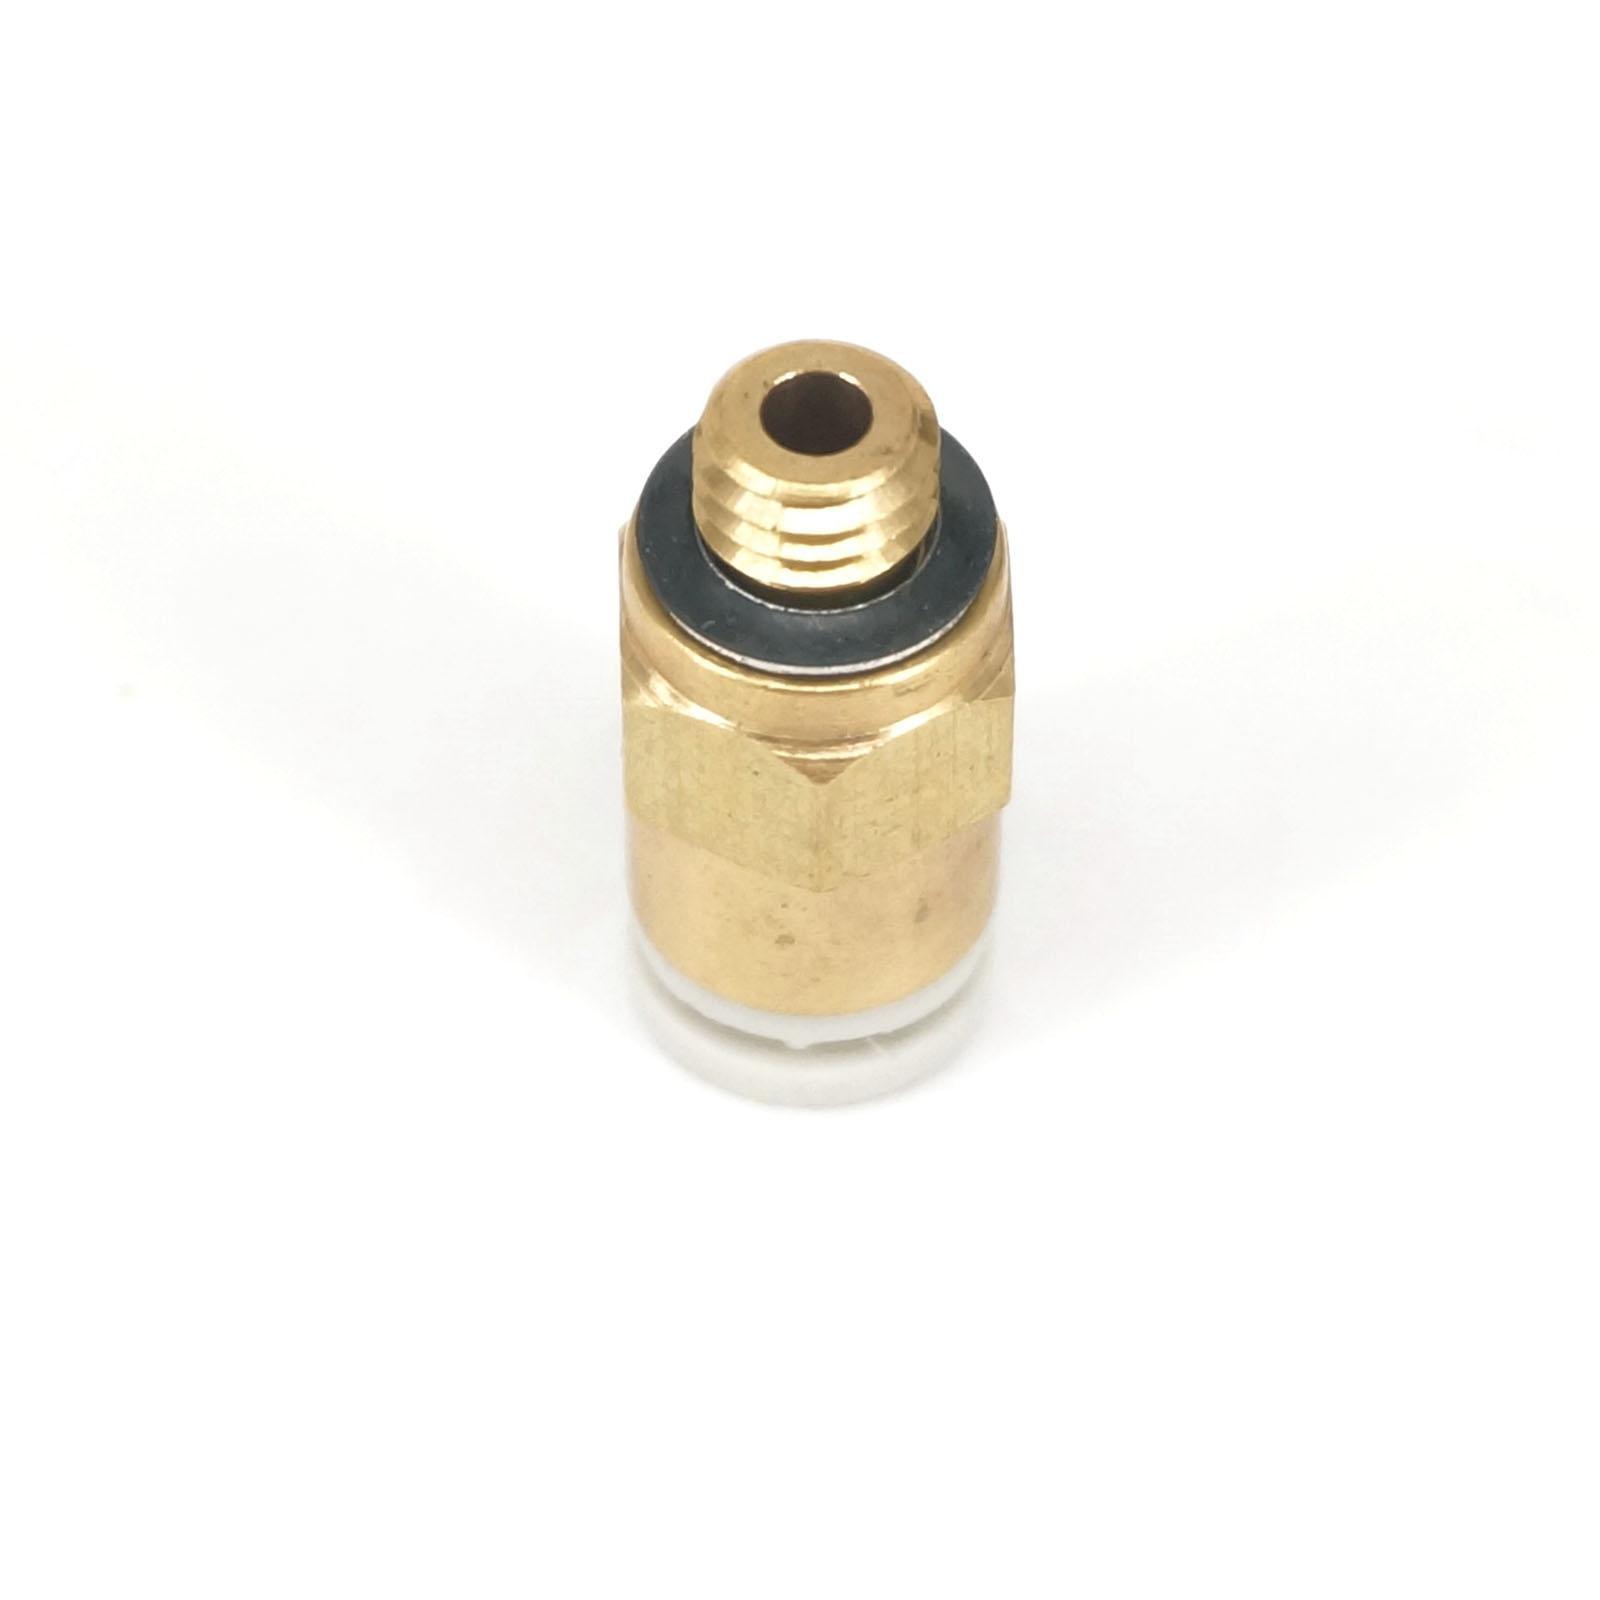 KQ2H04 M5 Satu Sentuhan Pas Push Dalam Laki laki Konektor Berlaku Tubing O D 4mm Port Ukuran M5 x 0 8 KQ2H04M5